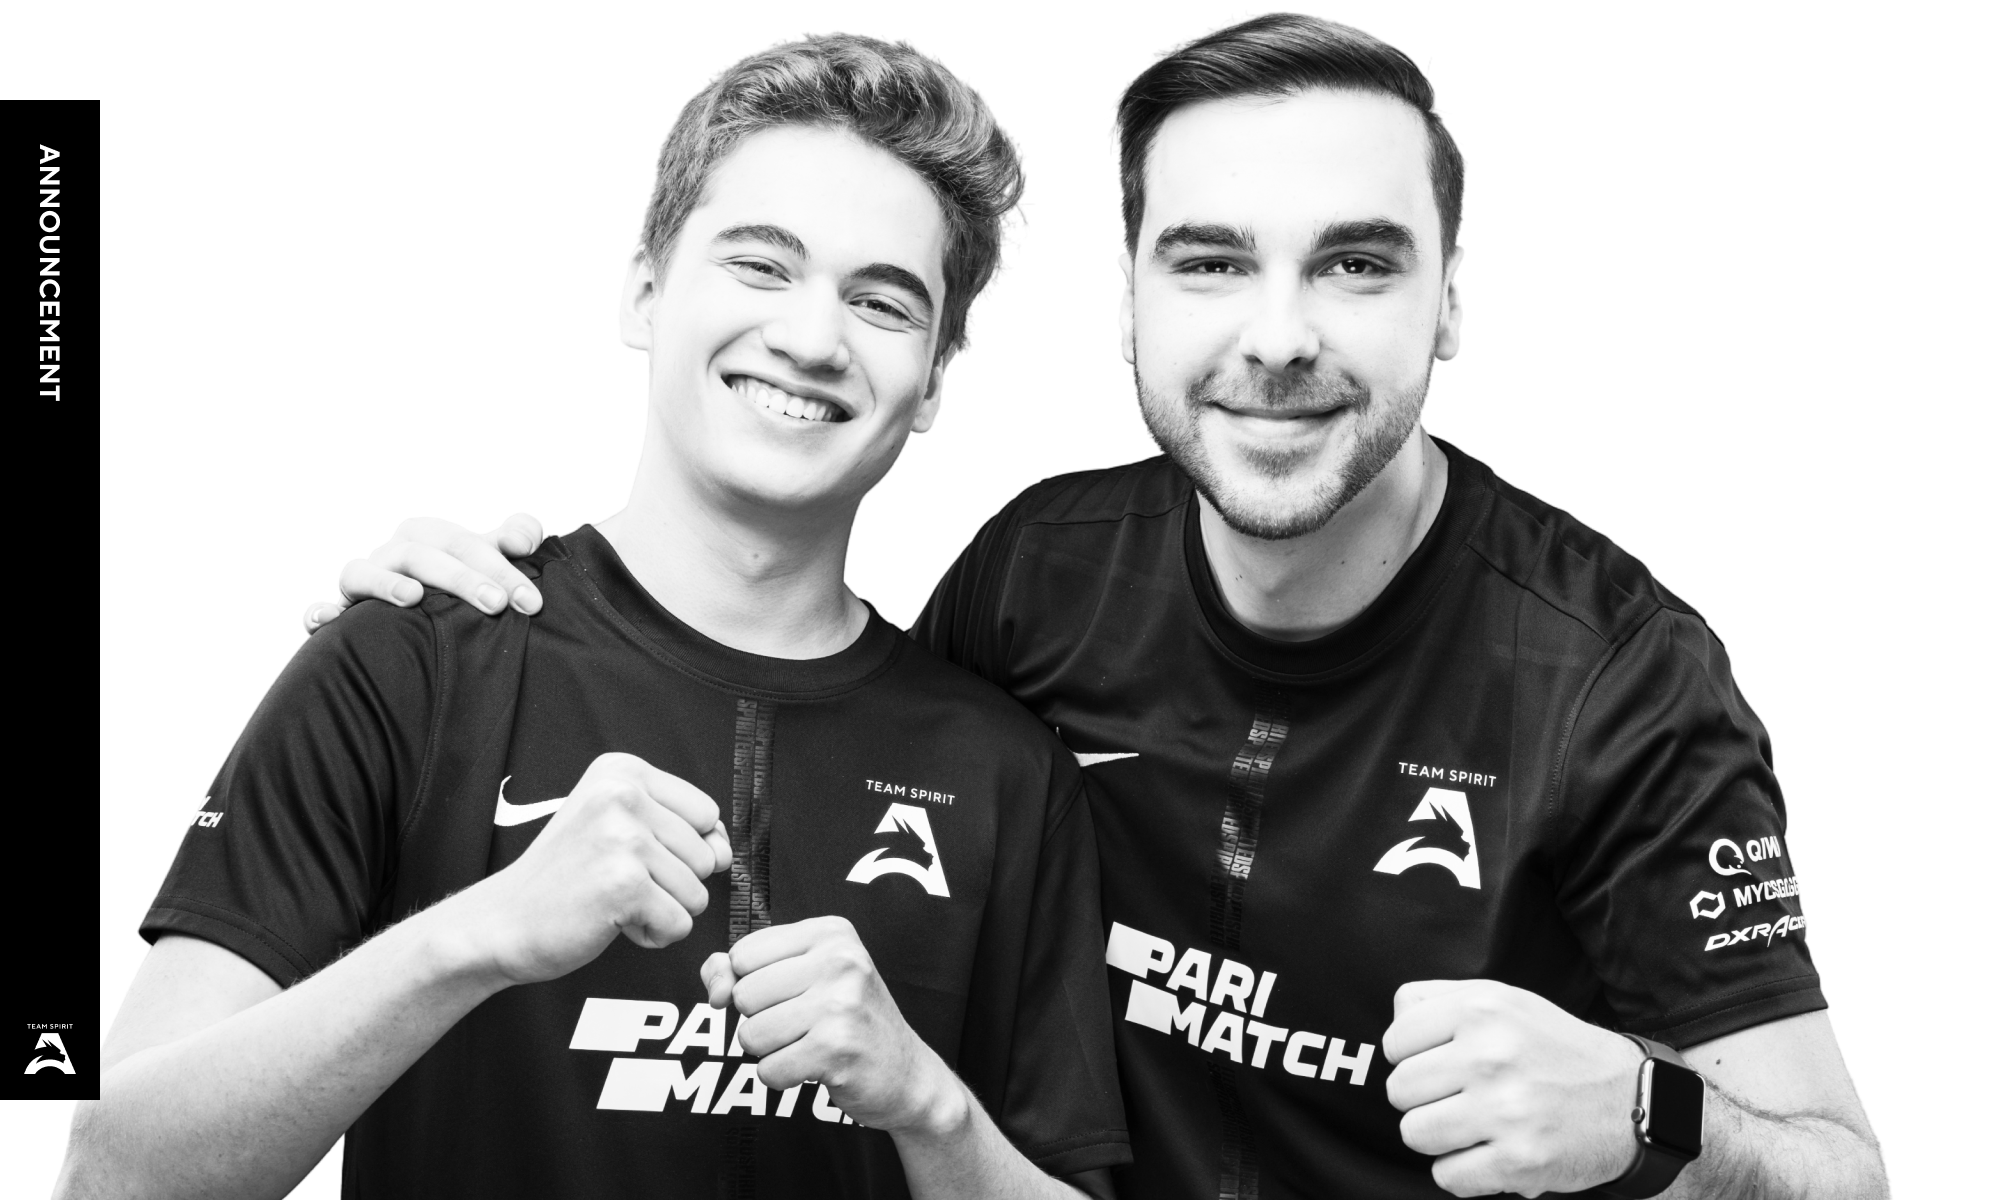 Team Spirit Academy